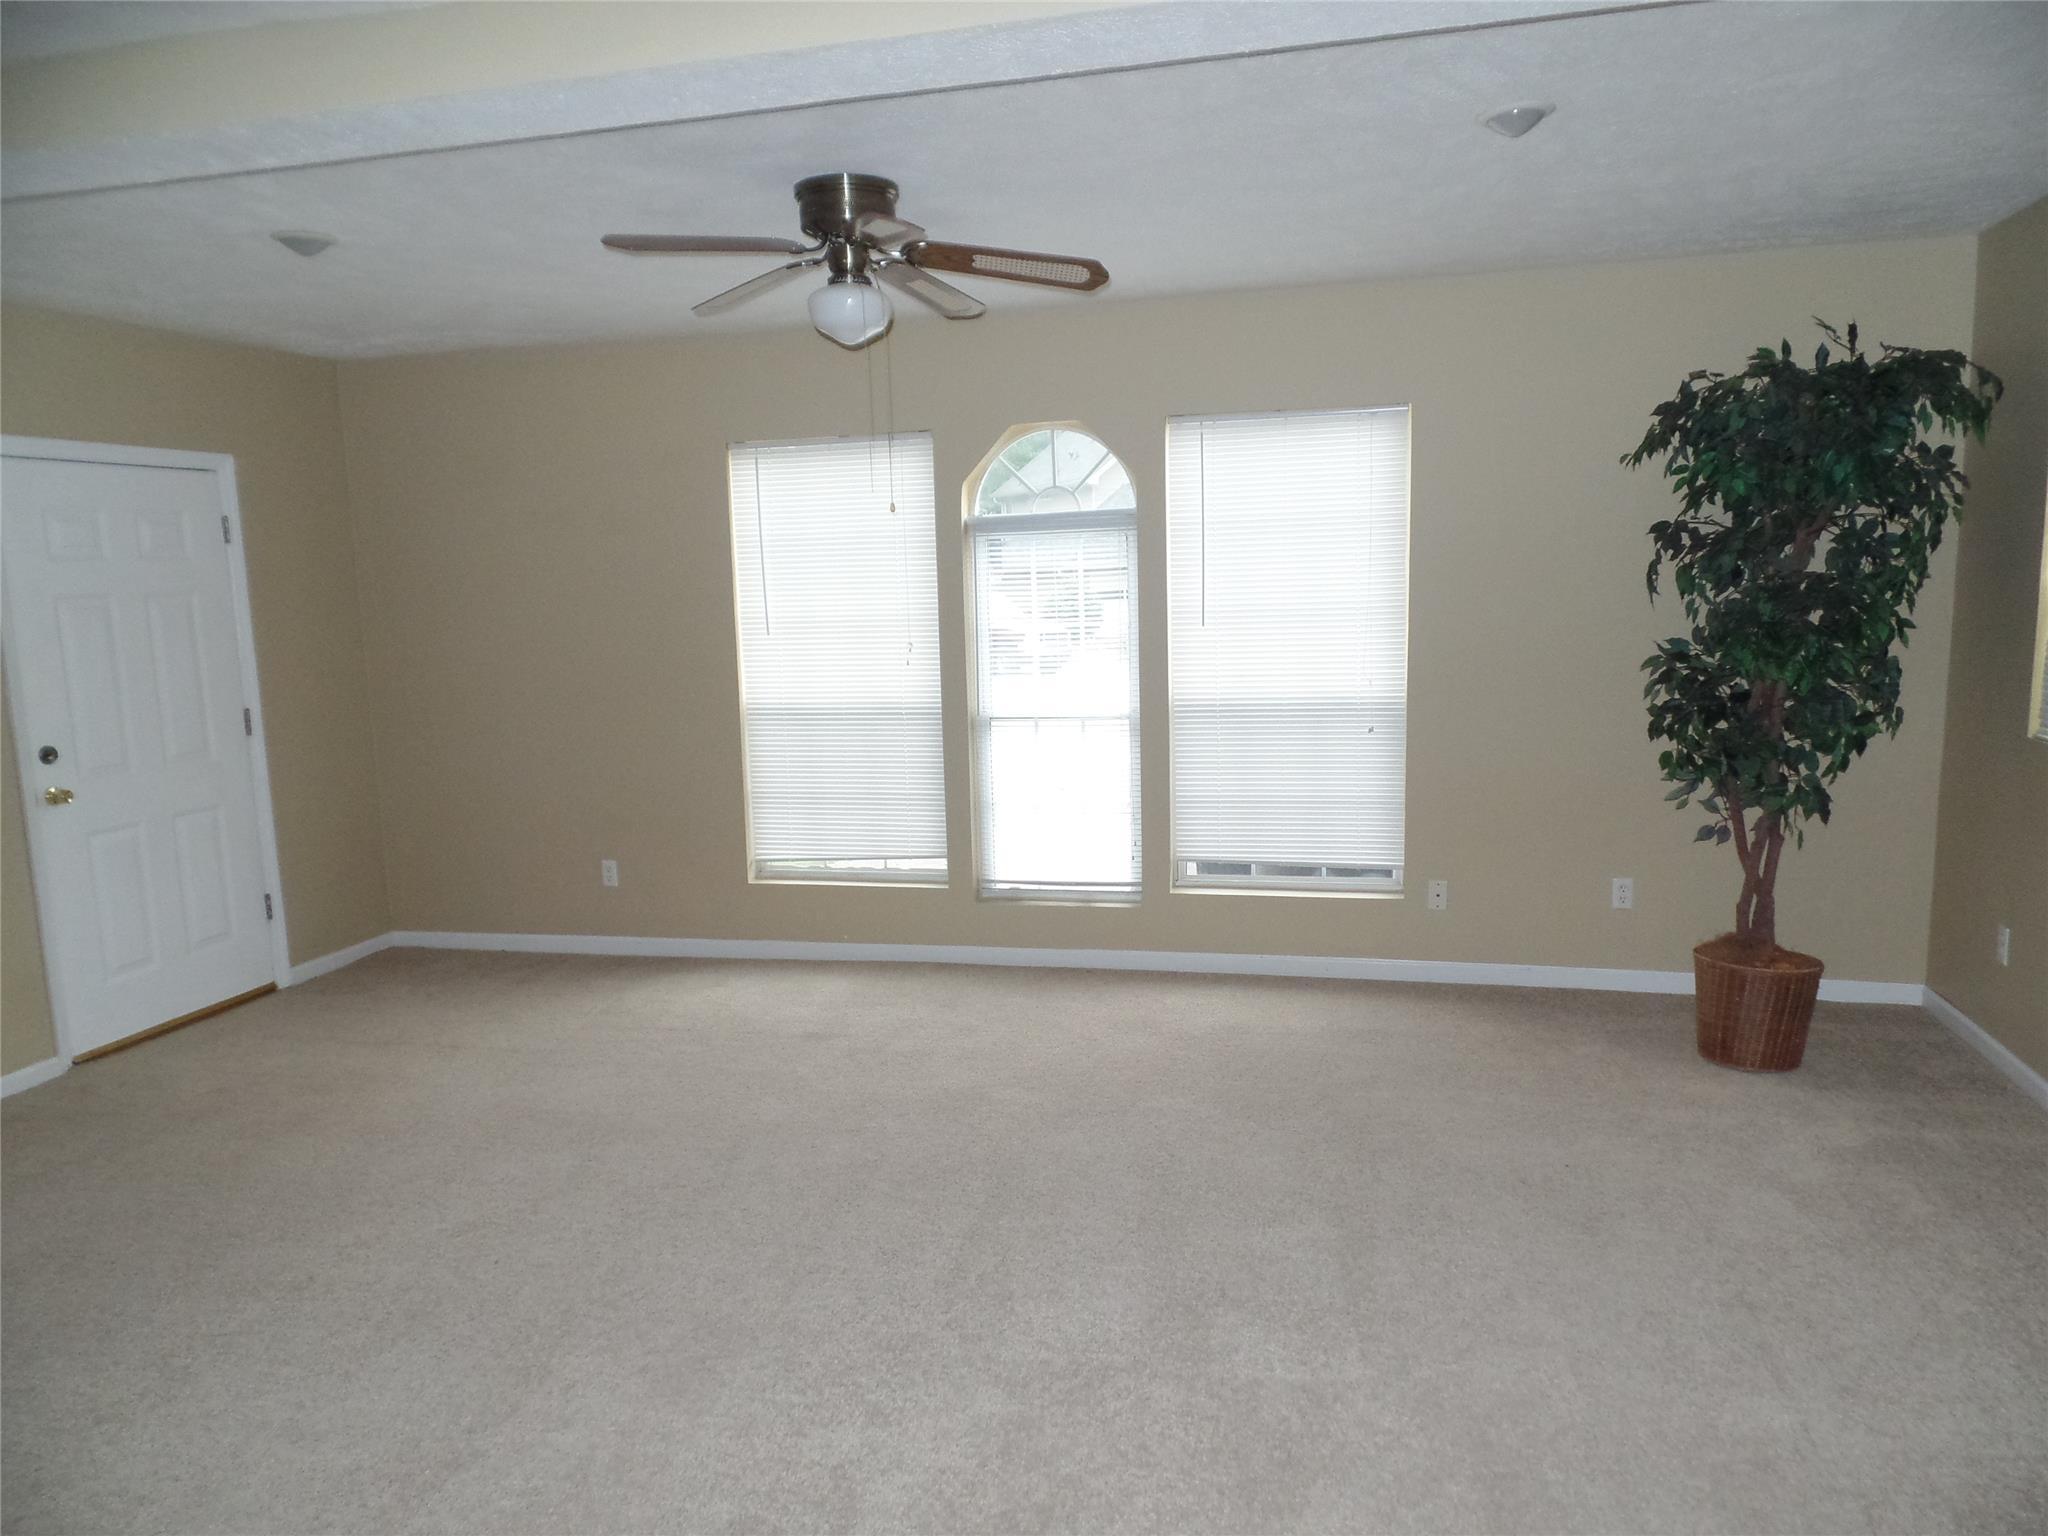 Photo of 55 Braelinn Creek Court, Peachtree City, GA, 30269